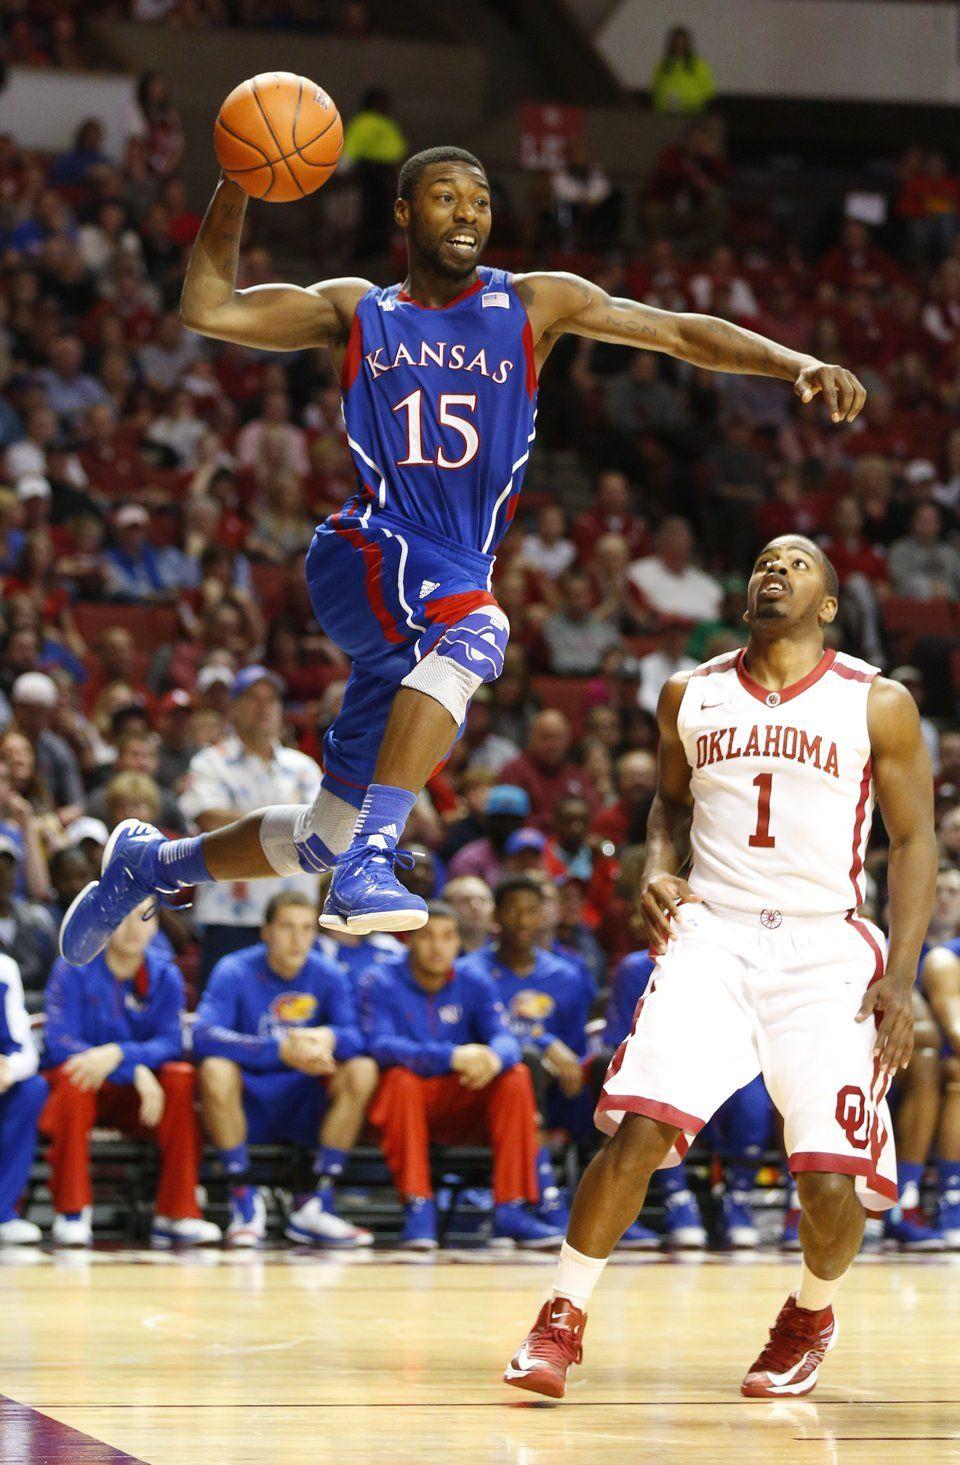 Kansas guard Elijah Johnson soars in for a dunk against